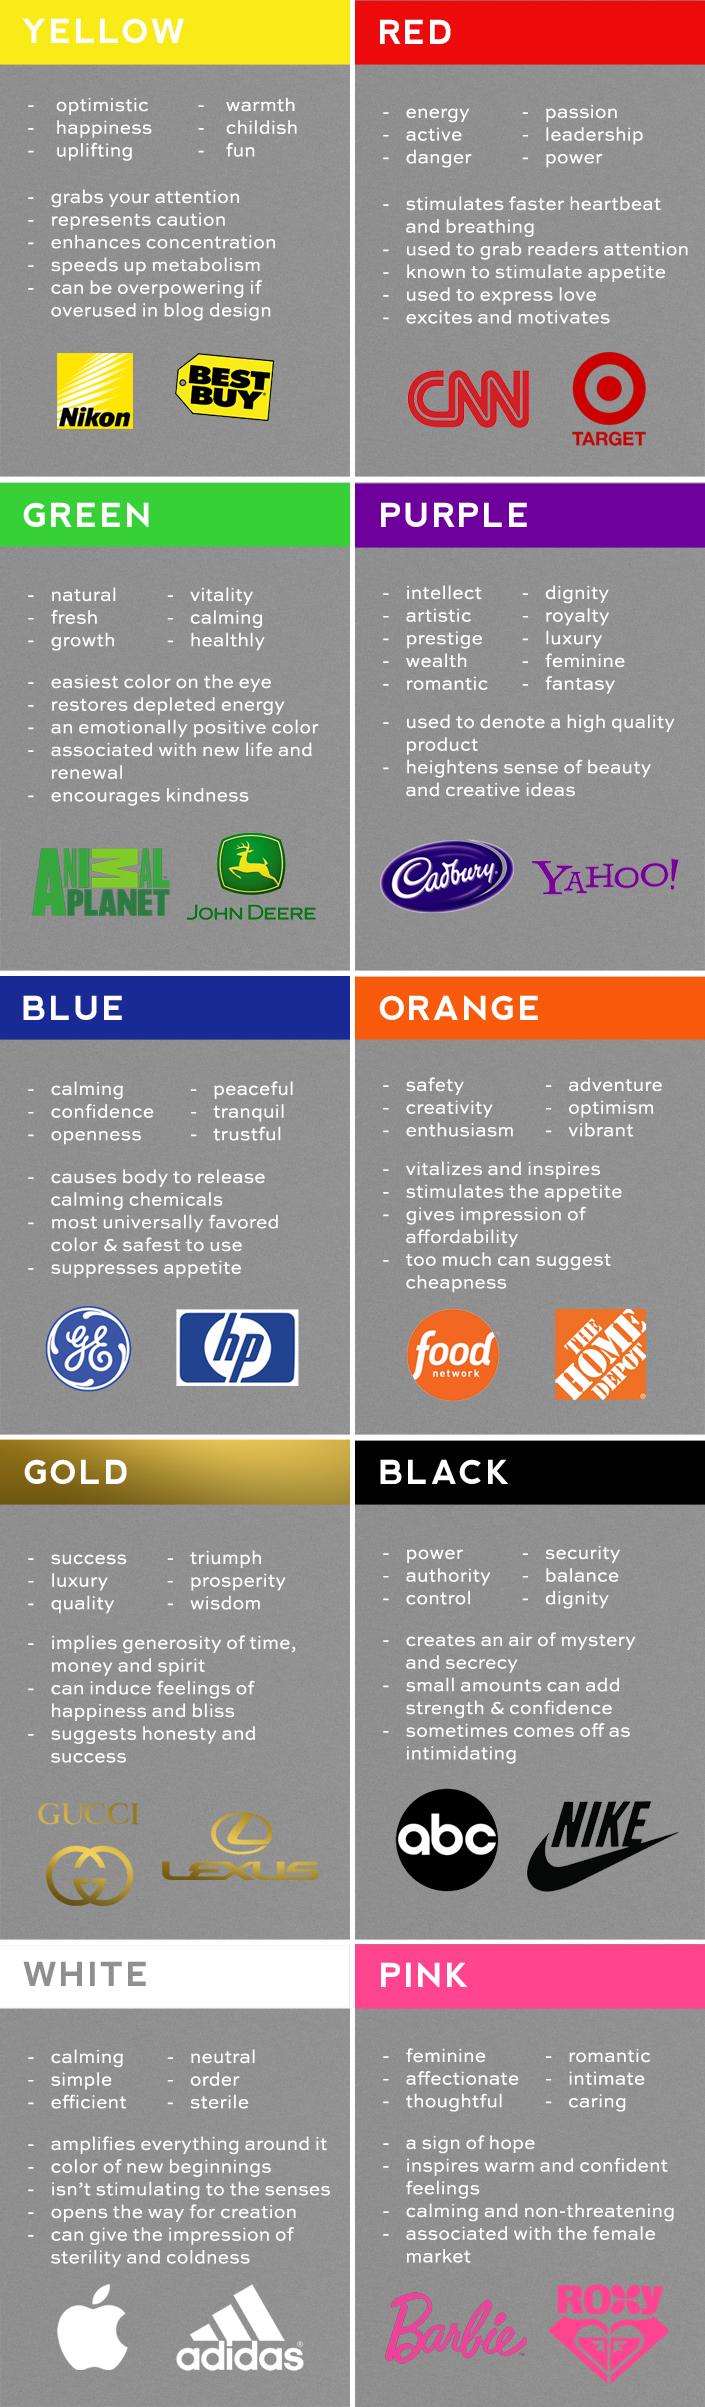 color-chartFINAL